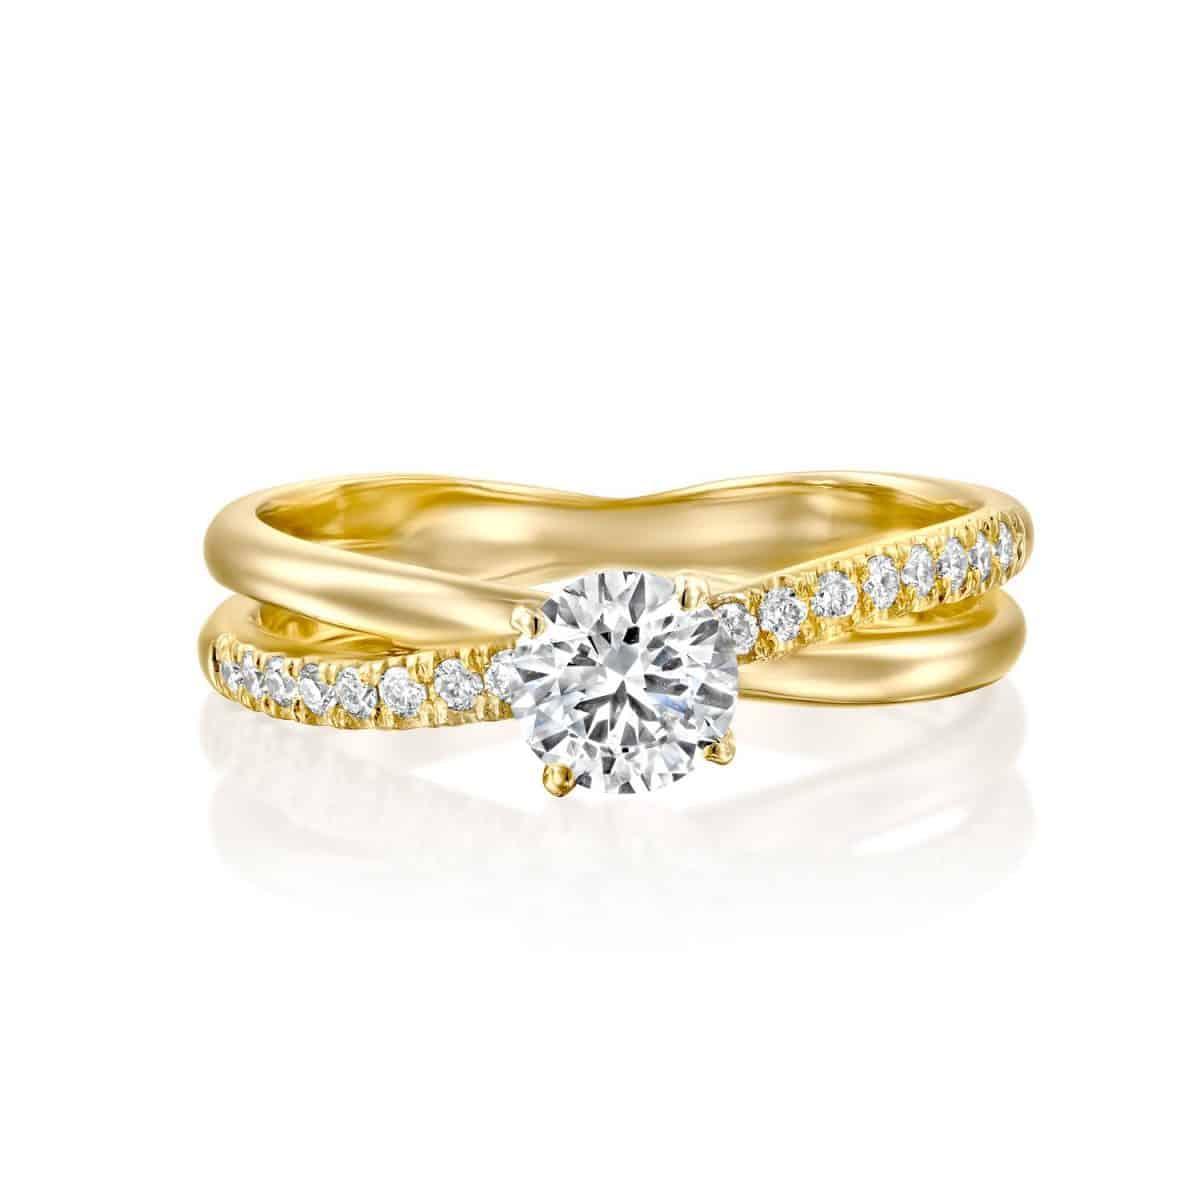 Monique - Twist Yellow Gold Lab Grown Diamond Engagement Ring 0.41ct. - laying